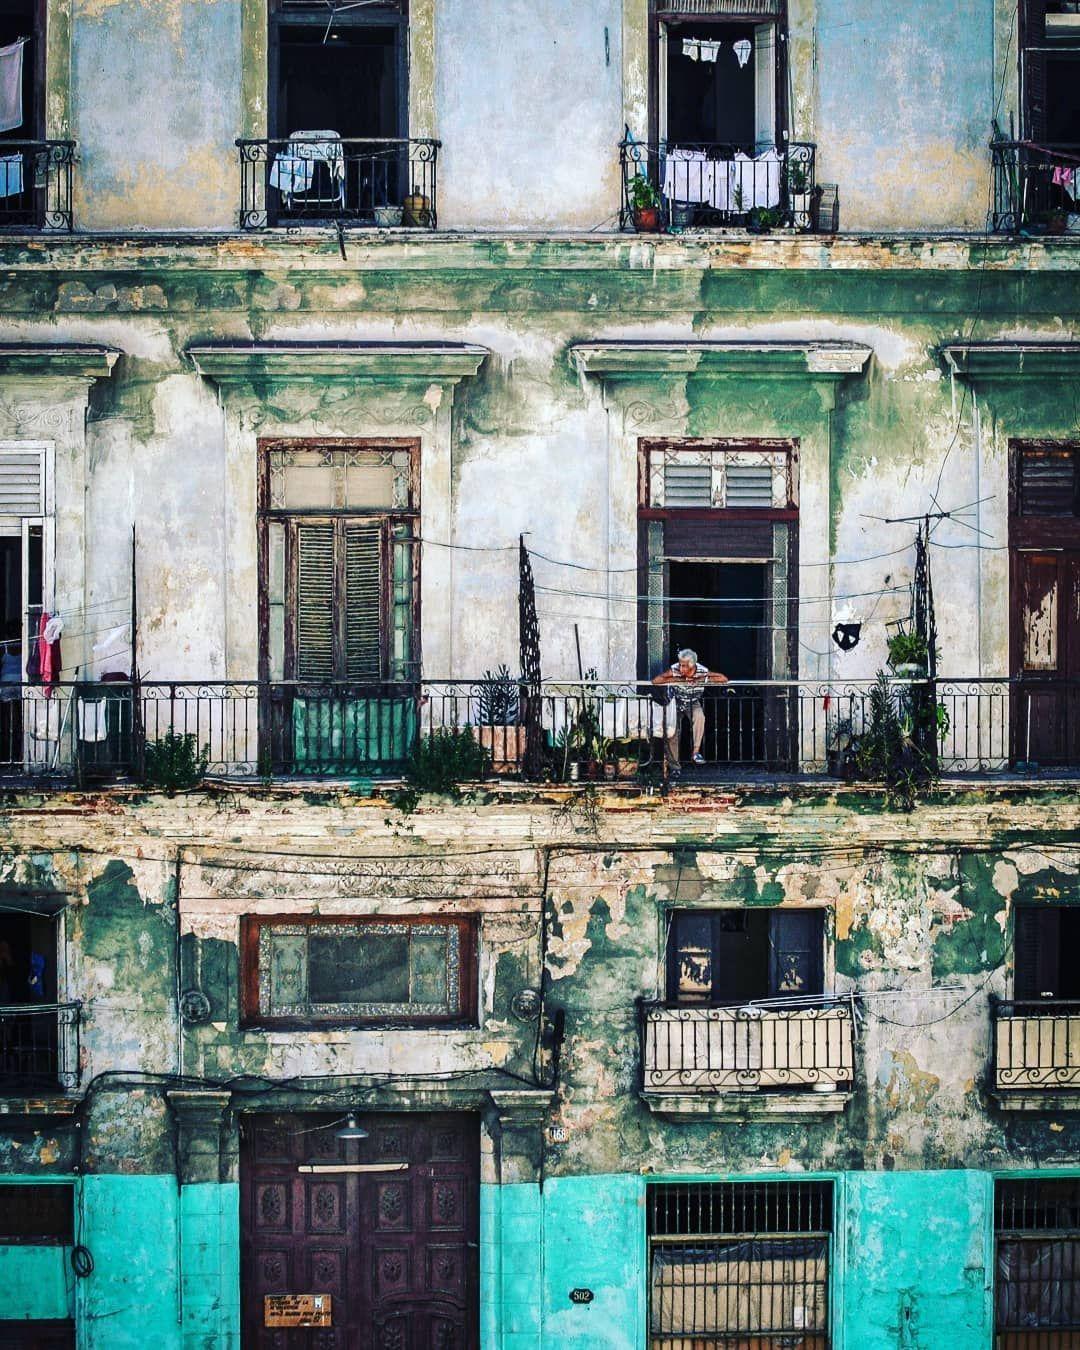 Cuban Days Street Views From Havana Cuba Lahabana Cuban Habana Havana Reise Travellphotography Kuba Kuban Havanna Reisen Caribbean Karibik Reise